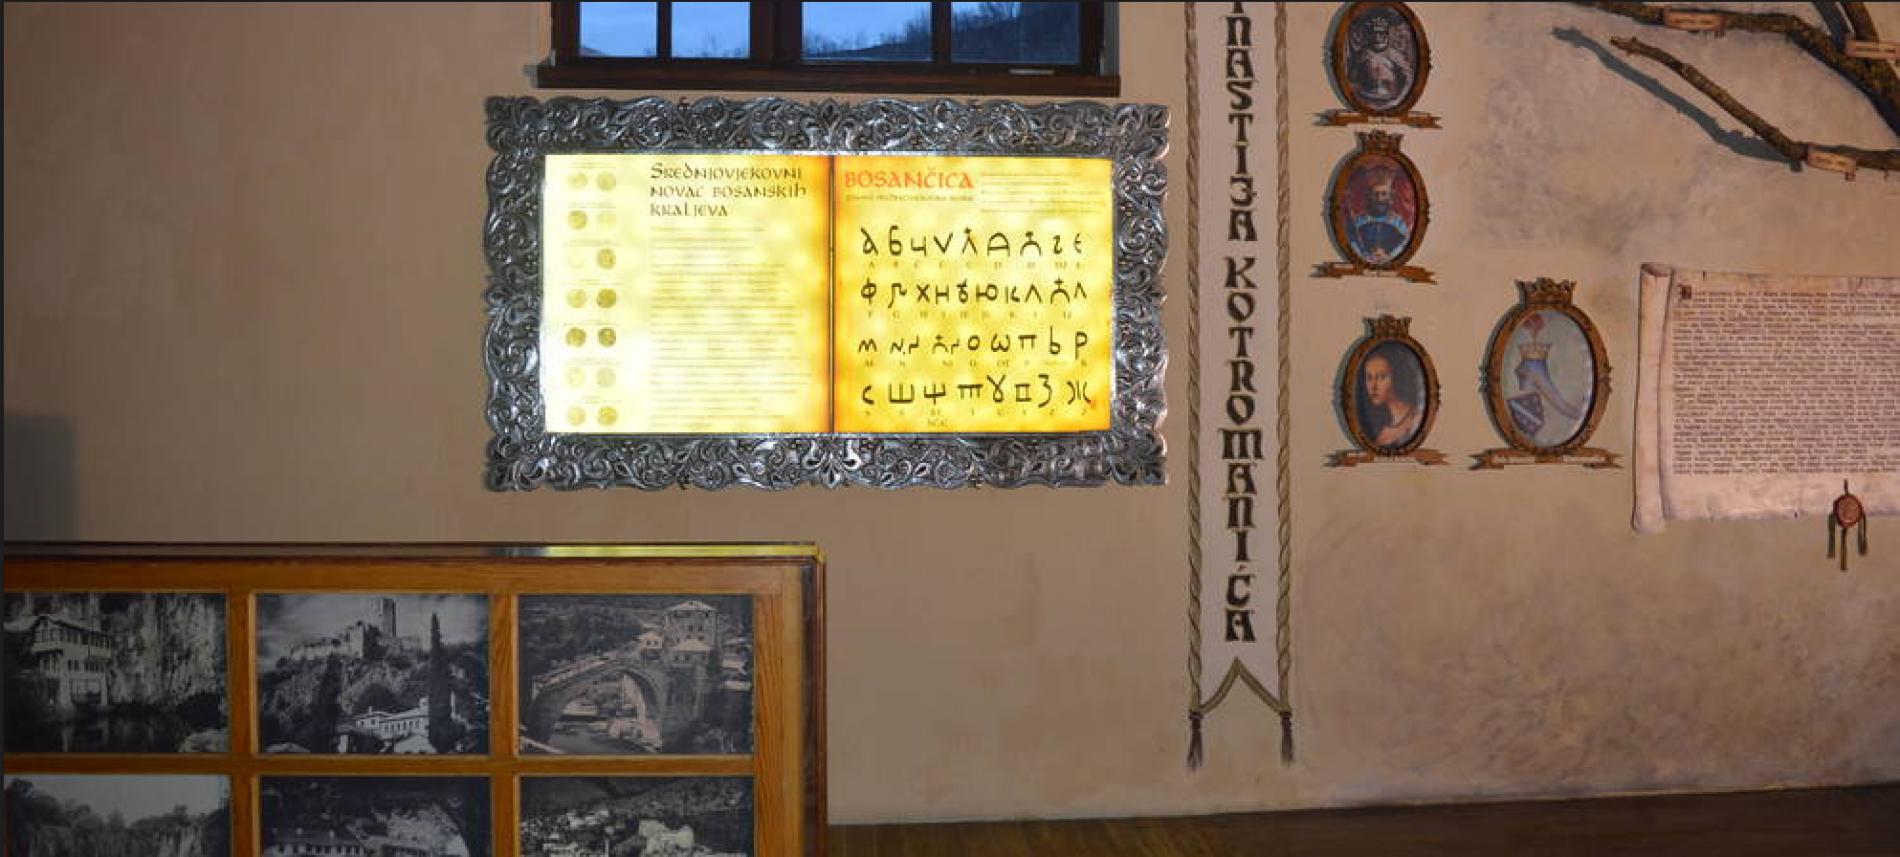 Mali muzej Bosne i Hercegovine: Bosanski kraljevi, bosančica i Ahdnama pored Miljacke